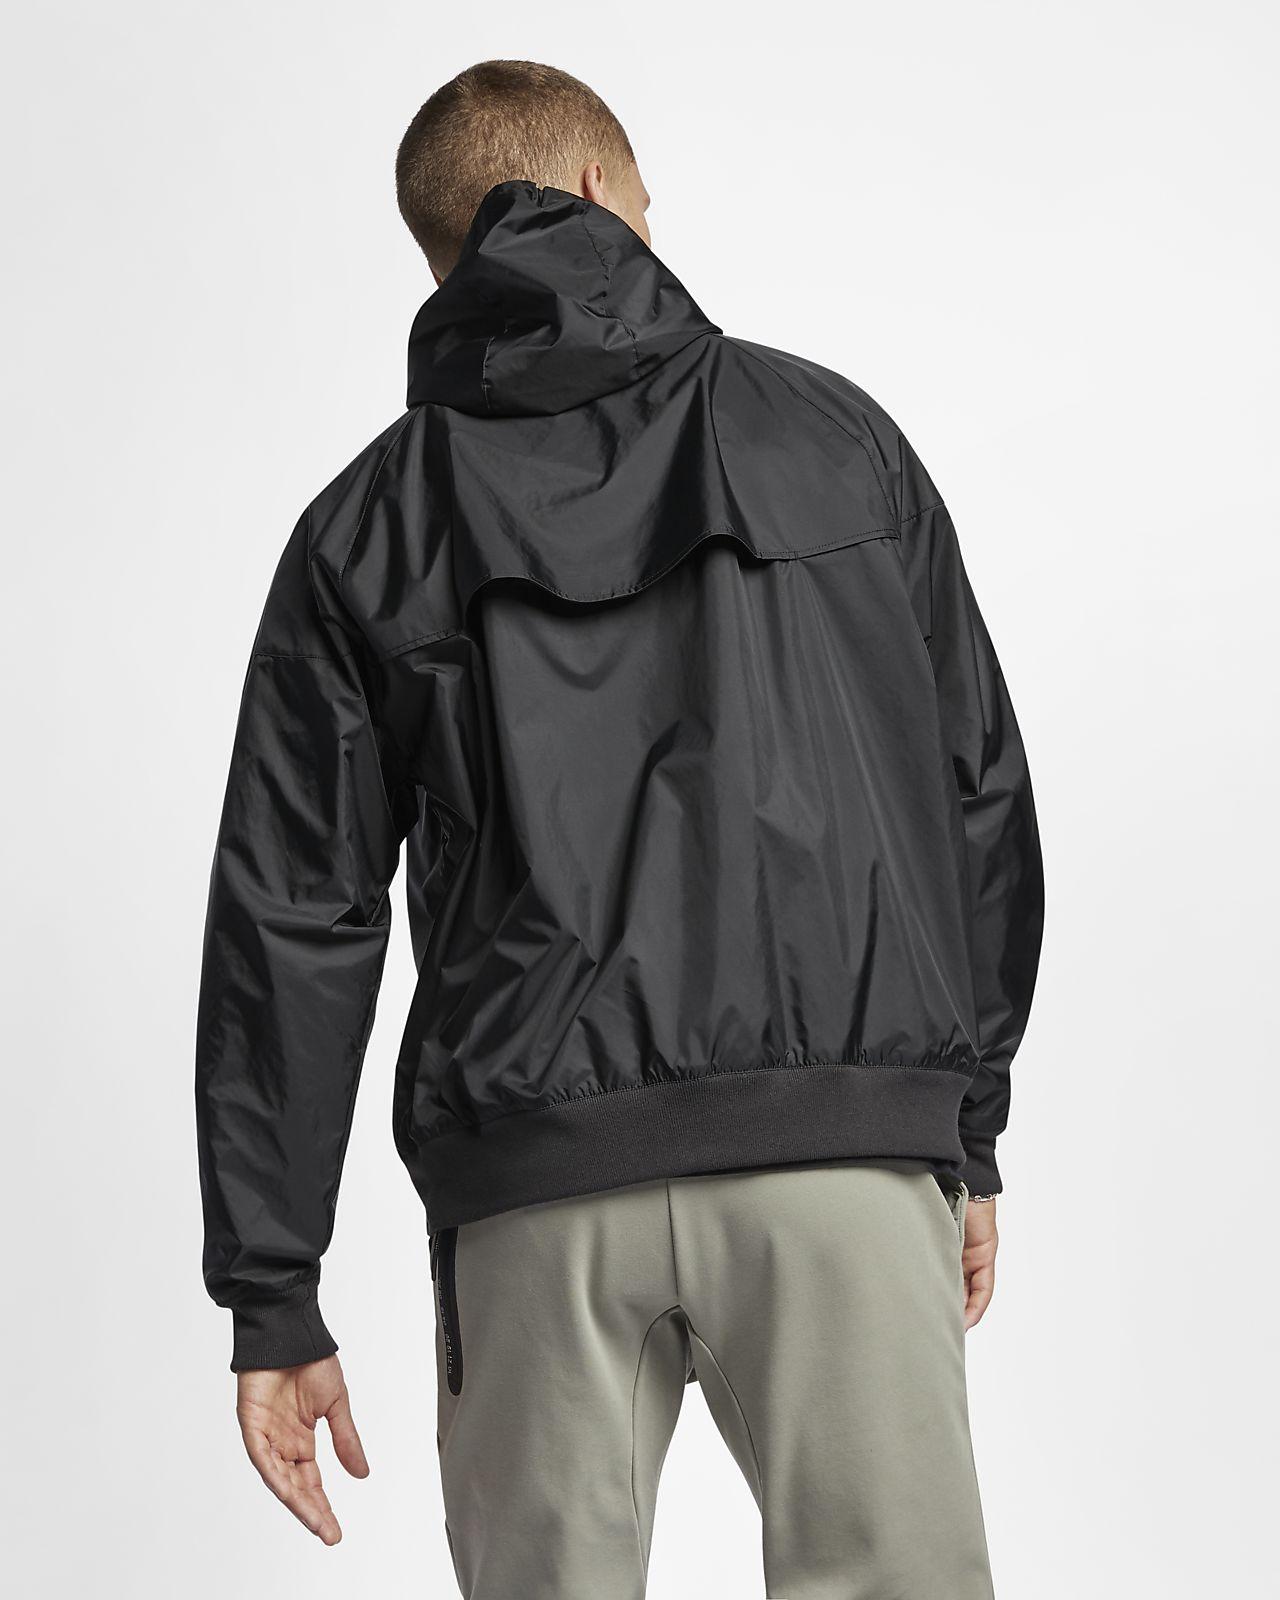 cf424cb83 Low Resolution Nike Sportswear Windrunner Men's Hooded Windbreaker Nike  Sportswear Windrunner Men's Hooded Windbreaker